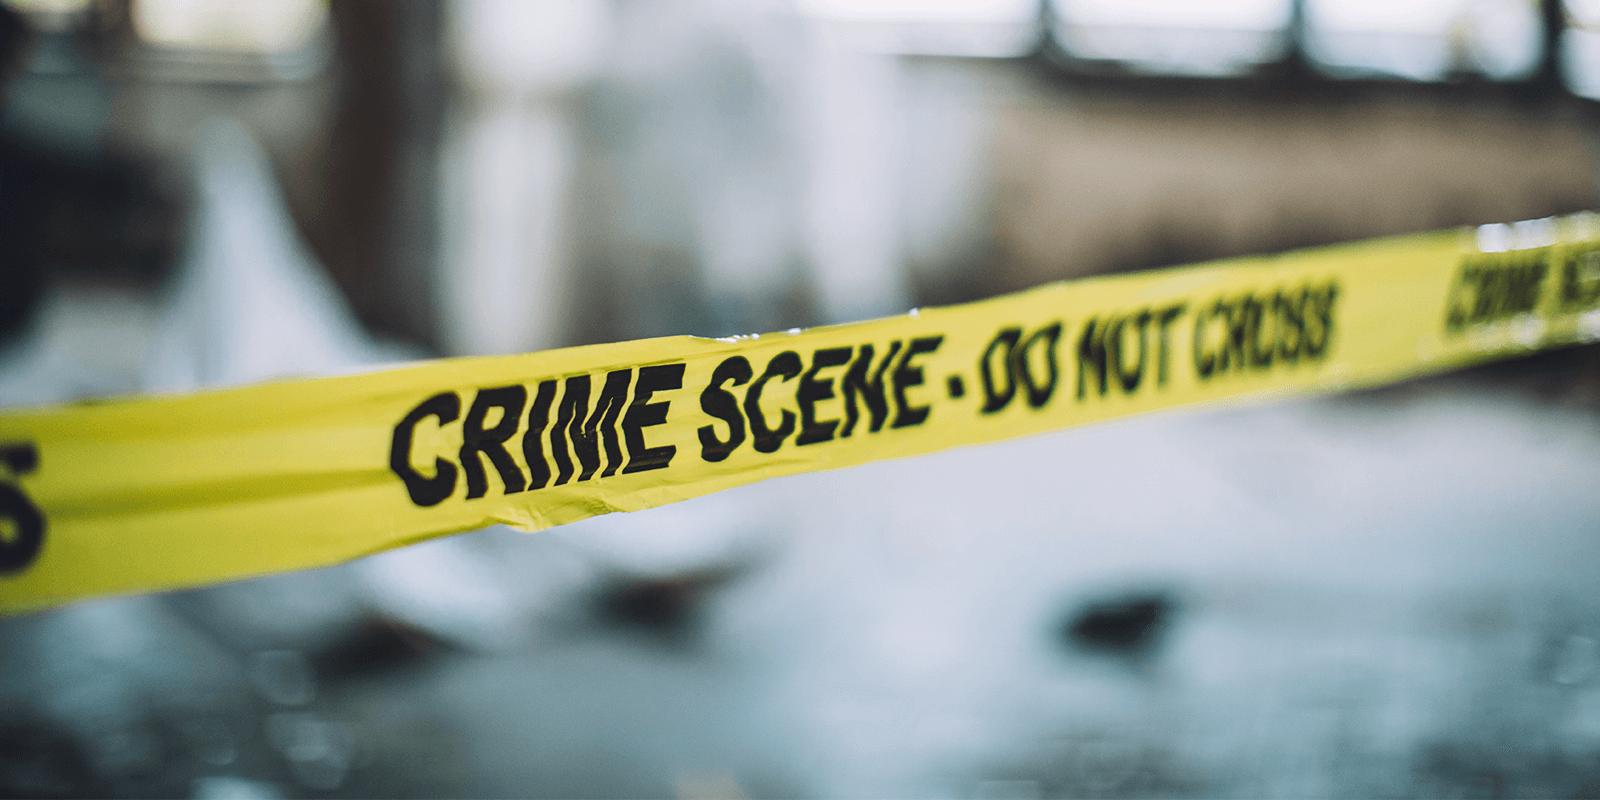 Yellow Police Tape Reads Crime Scene Do Not Cross District 1199J 9 25 Alling Street